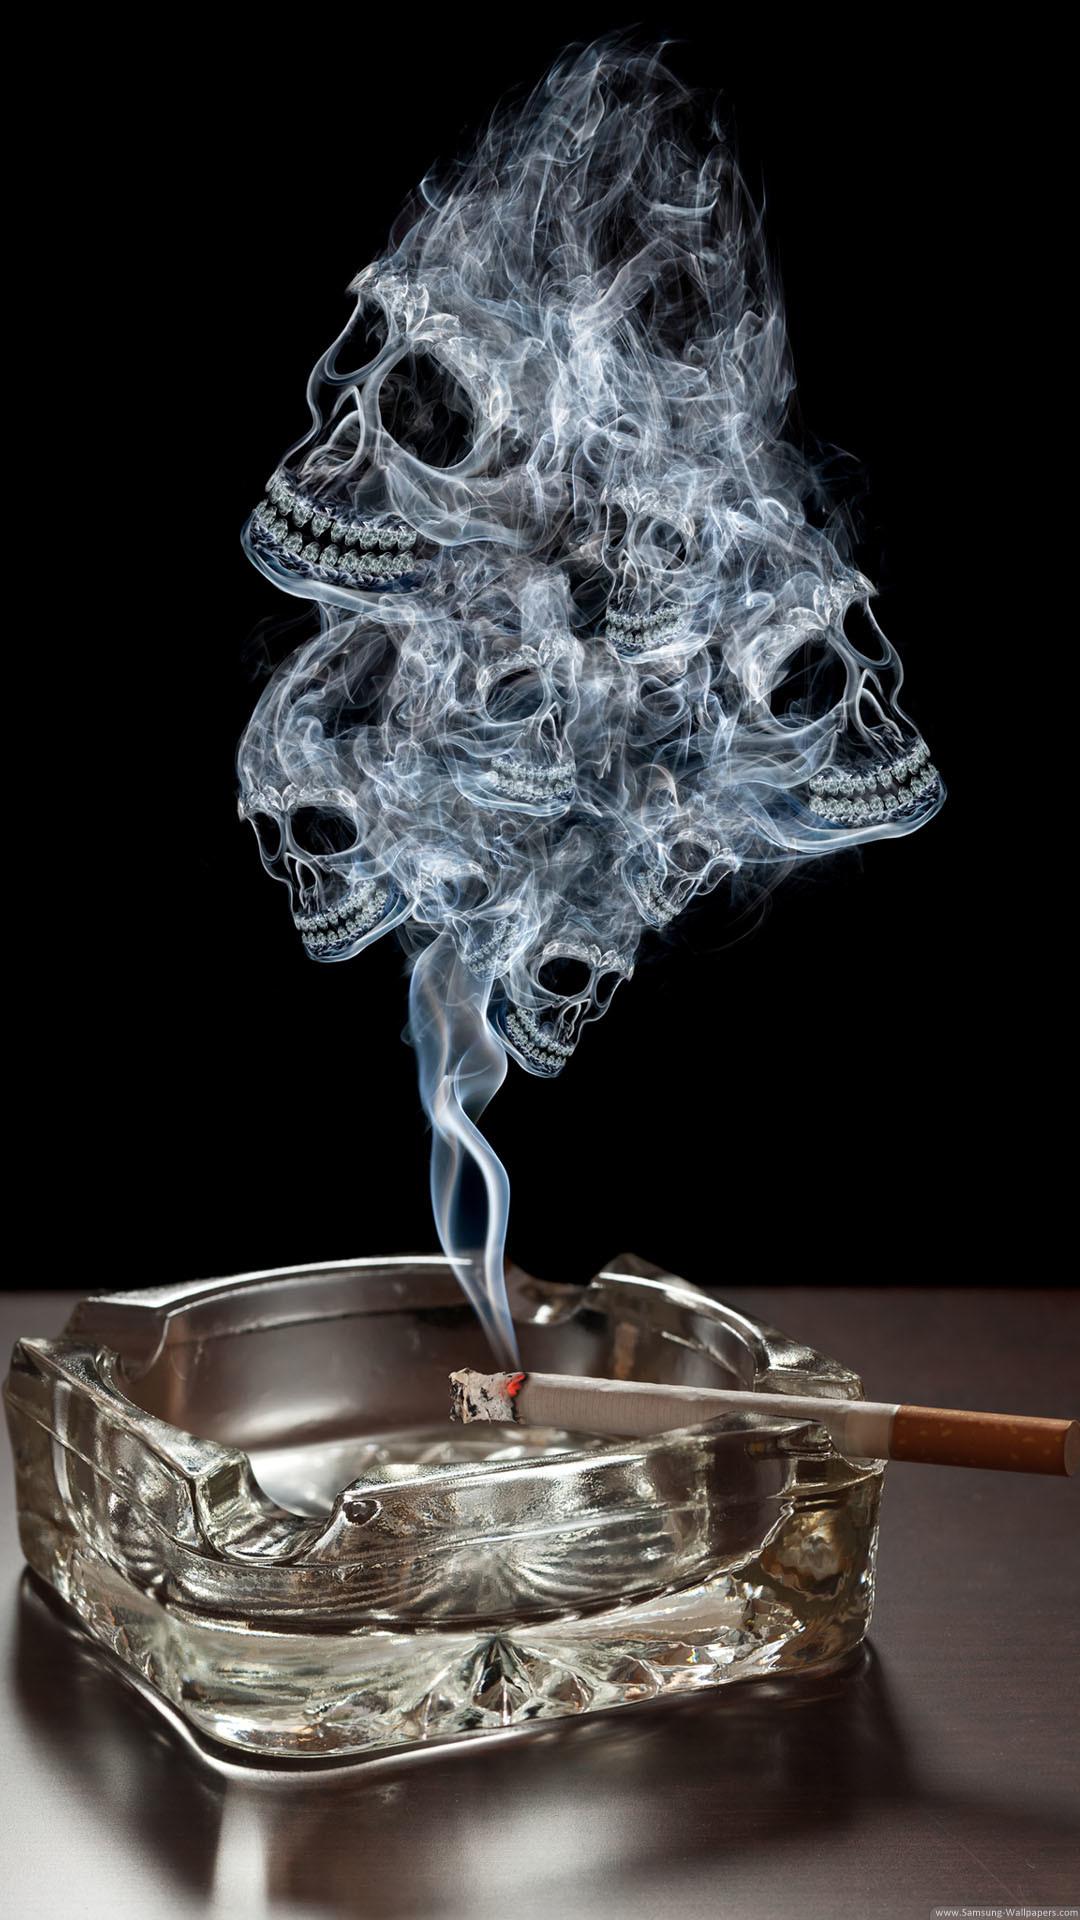 Smoke Skulls Ashtray Burning Cigarette iPhone 6 Plus HD Wallpaper